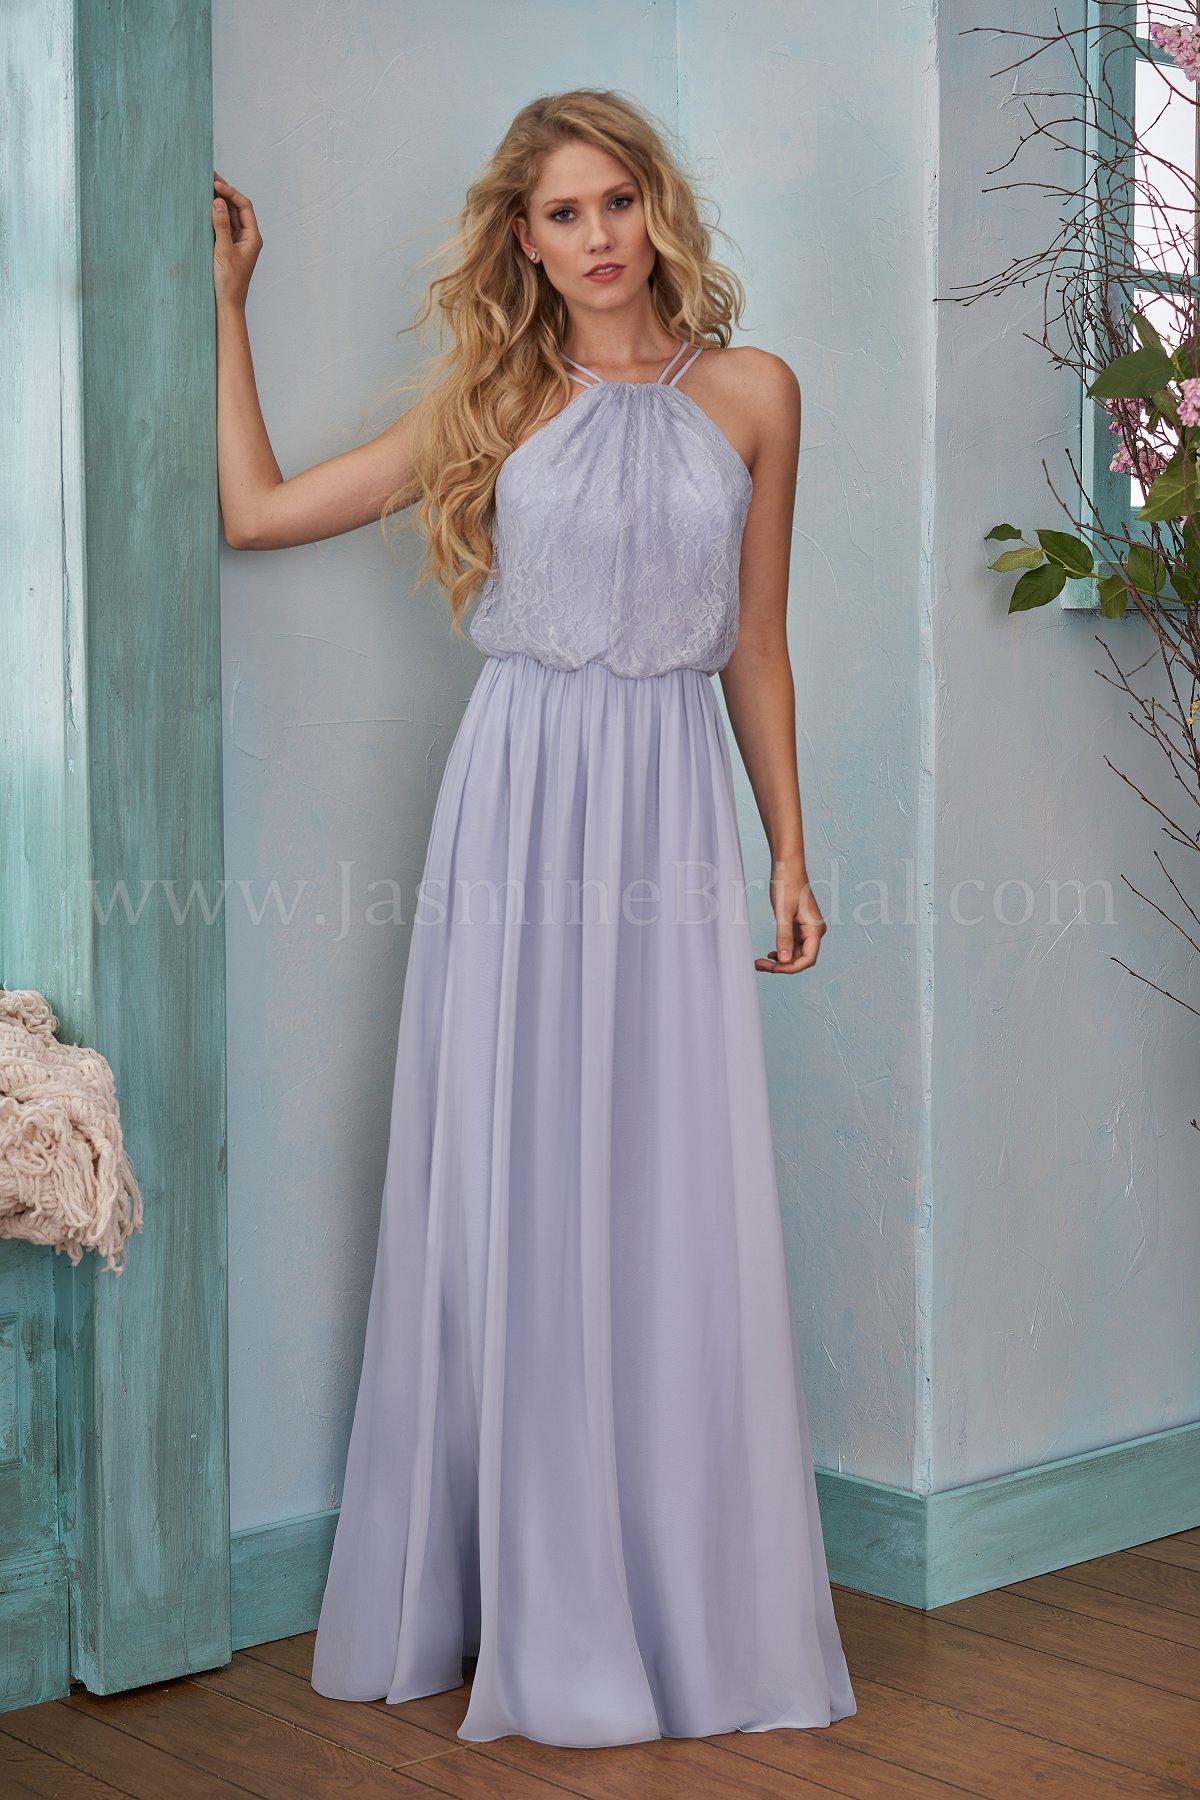 B203006 Long Halter Neckline Lace Poly Chiffon Bridesmaid Dress